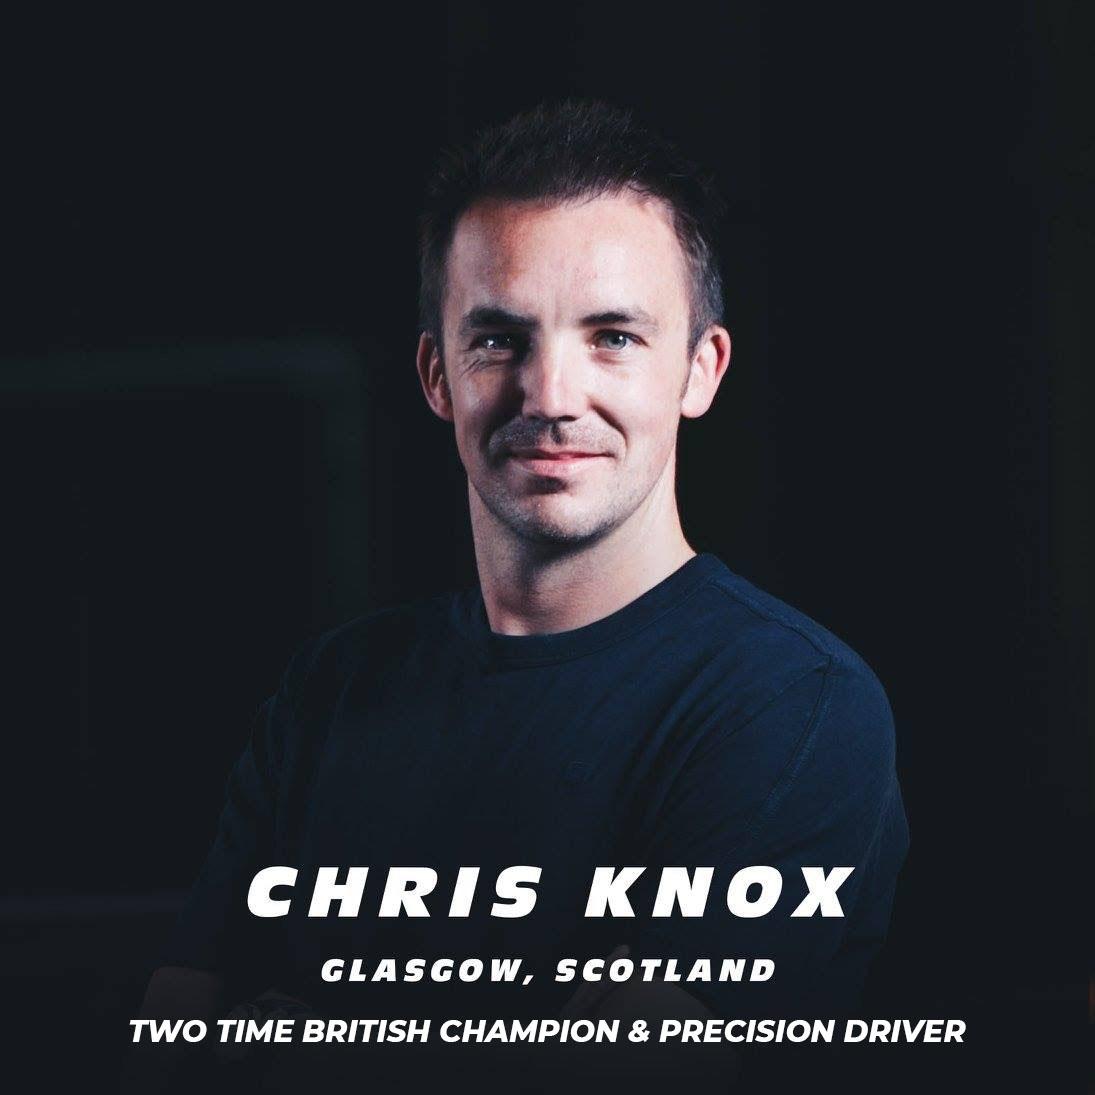 chris knox co uk